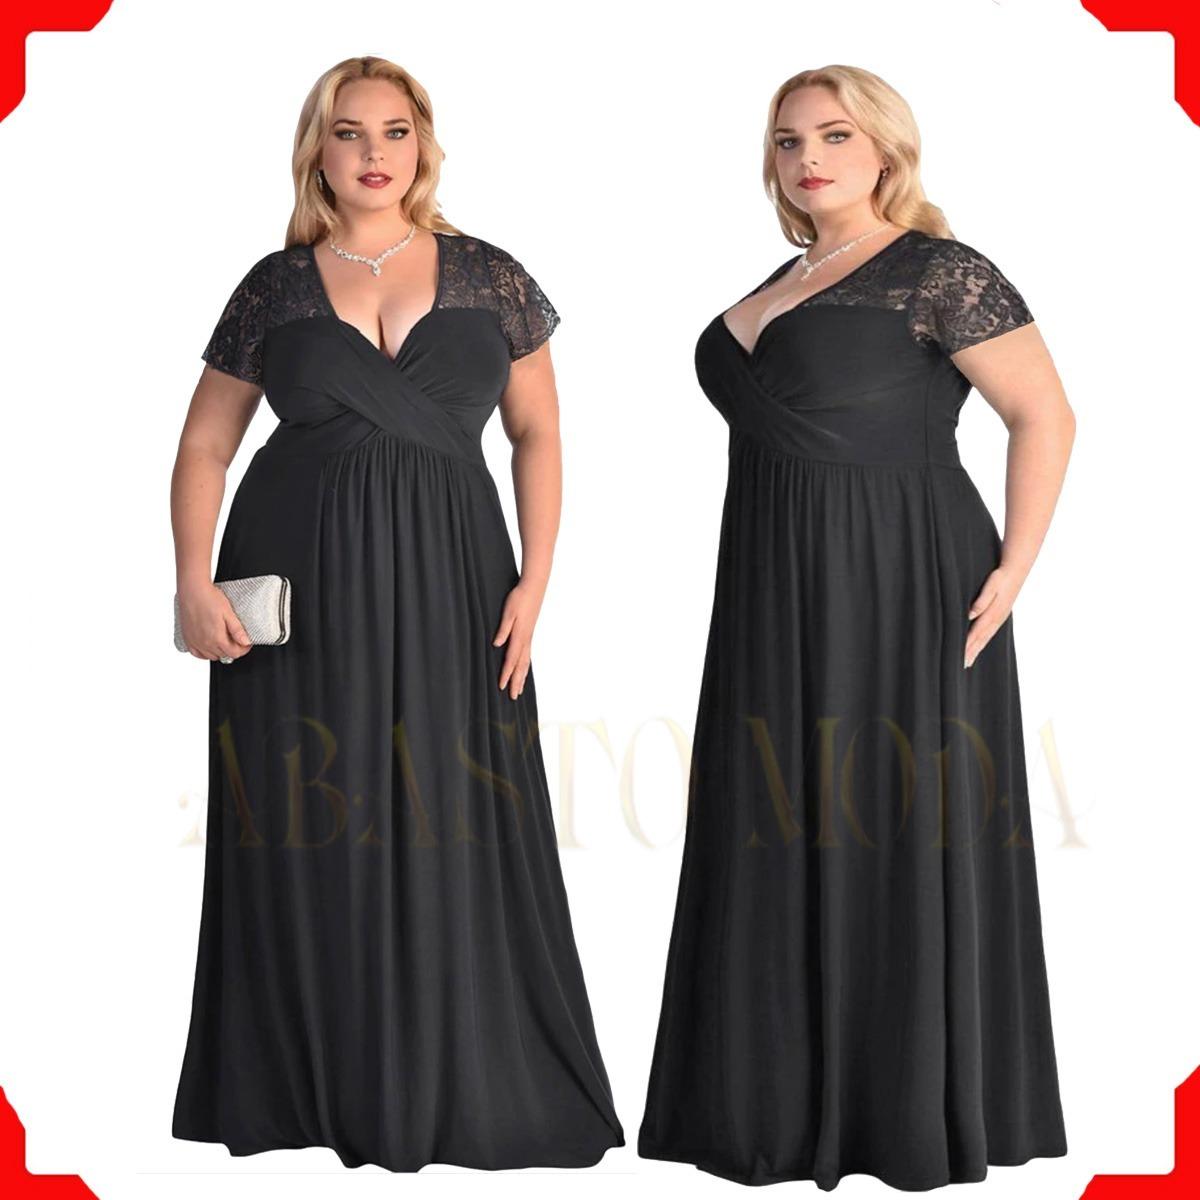 Alquiler vestidos fiesta talles especiales